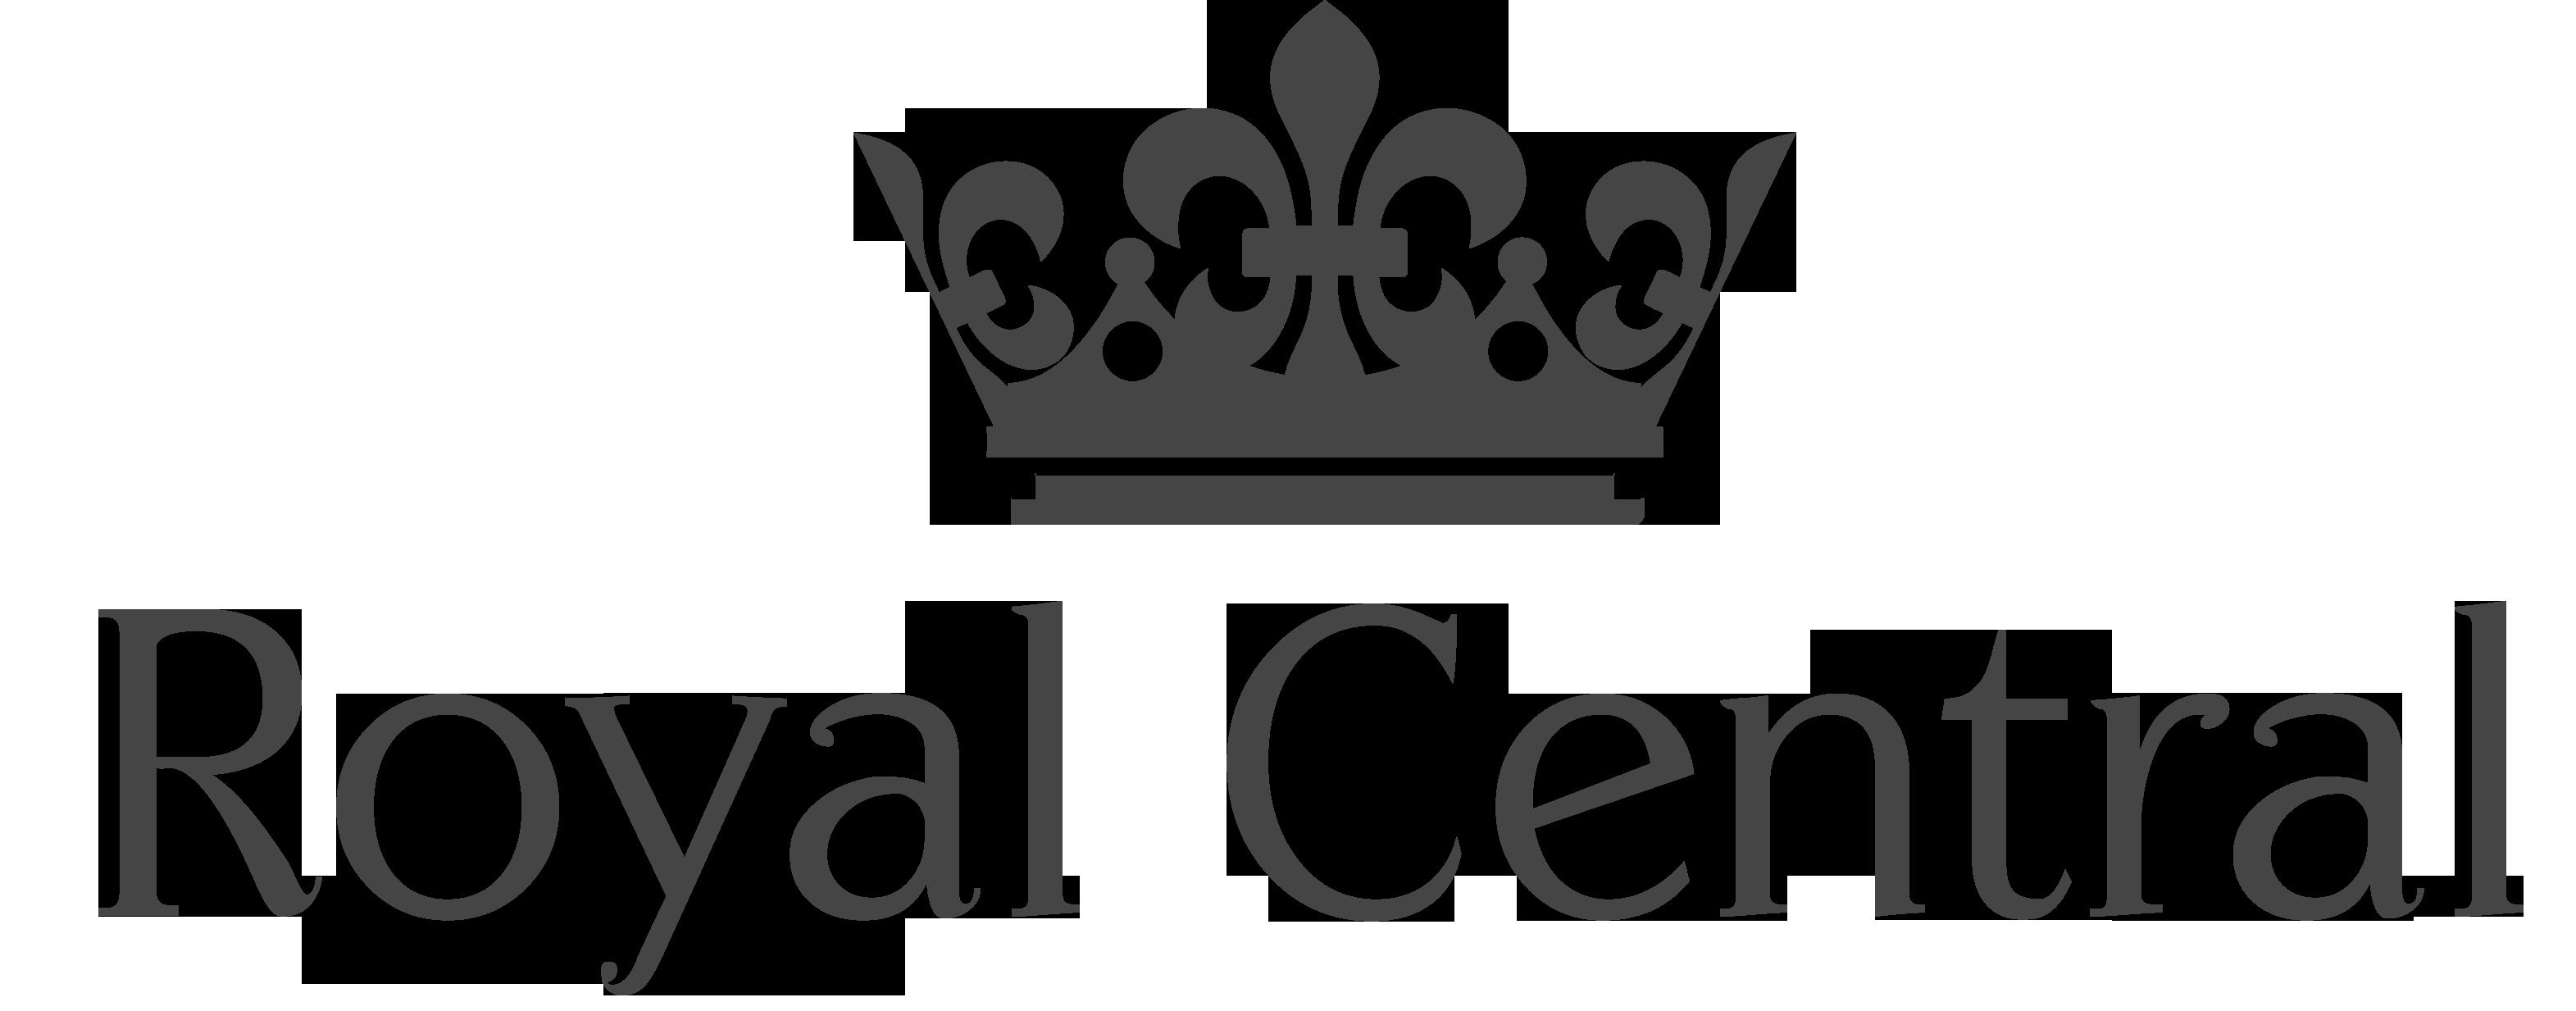 Kansas city royals crown logo clipart svg library library Royal Logos svg library library